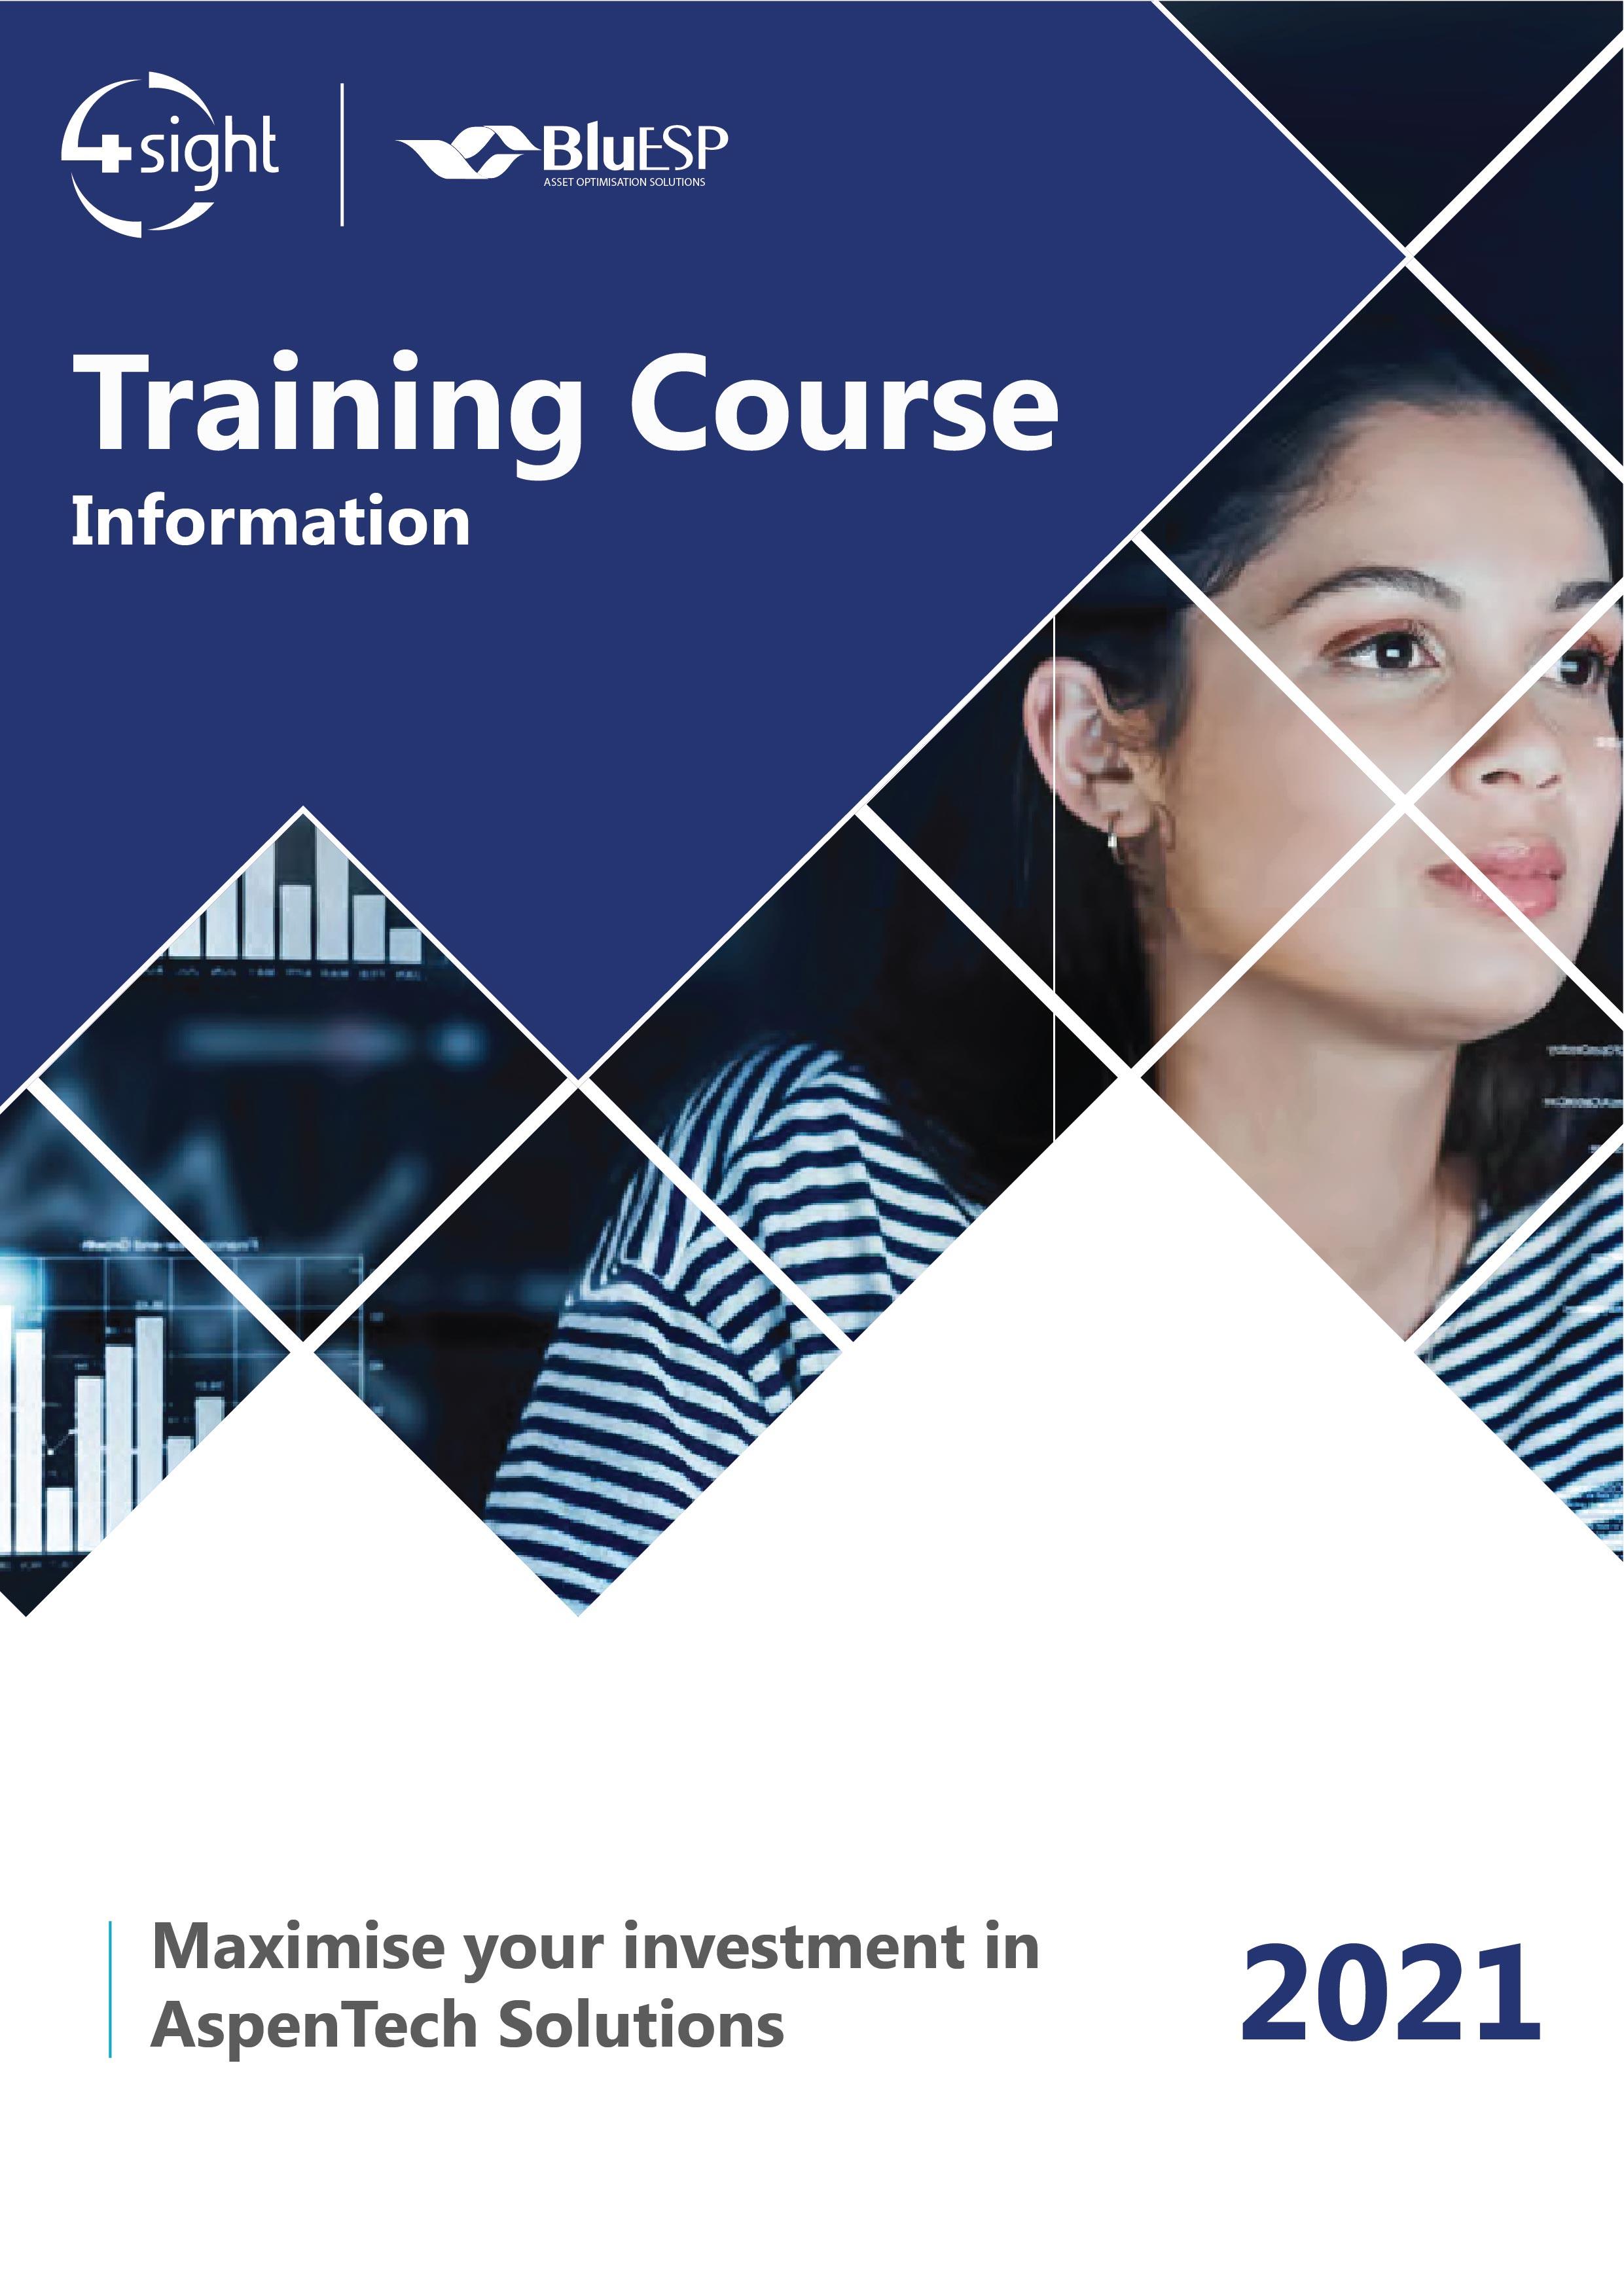 BluESP_Training Course Info_220121-01